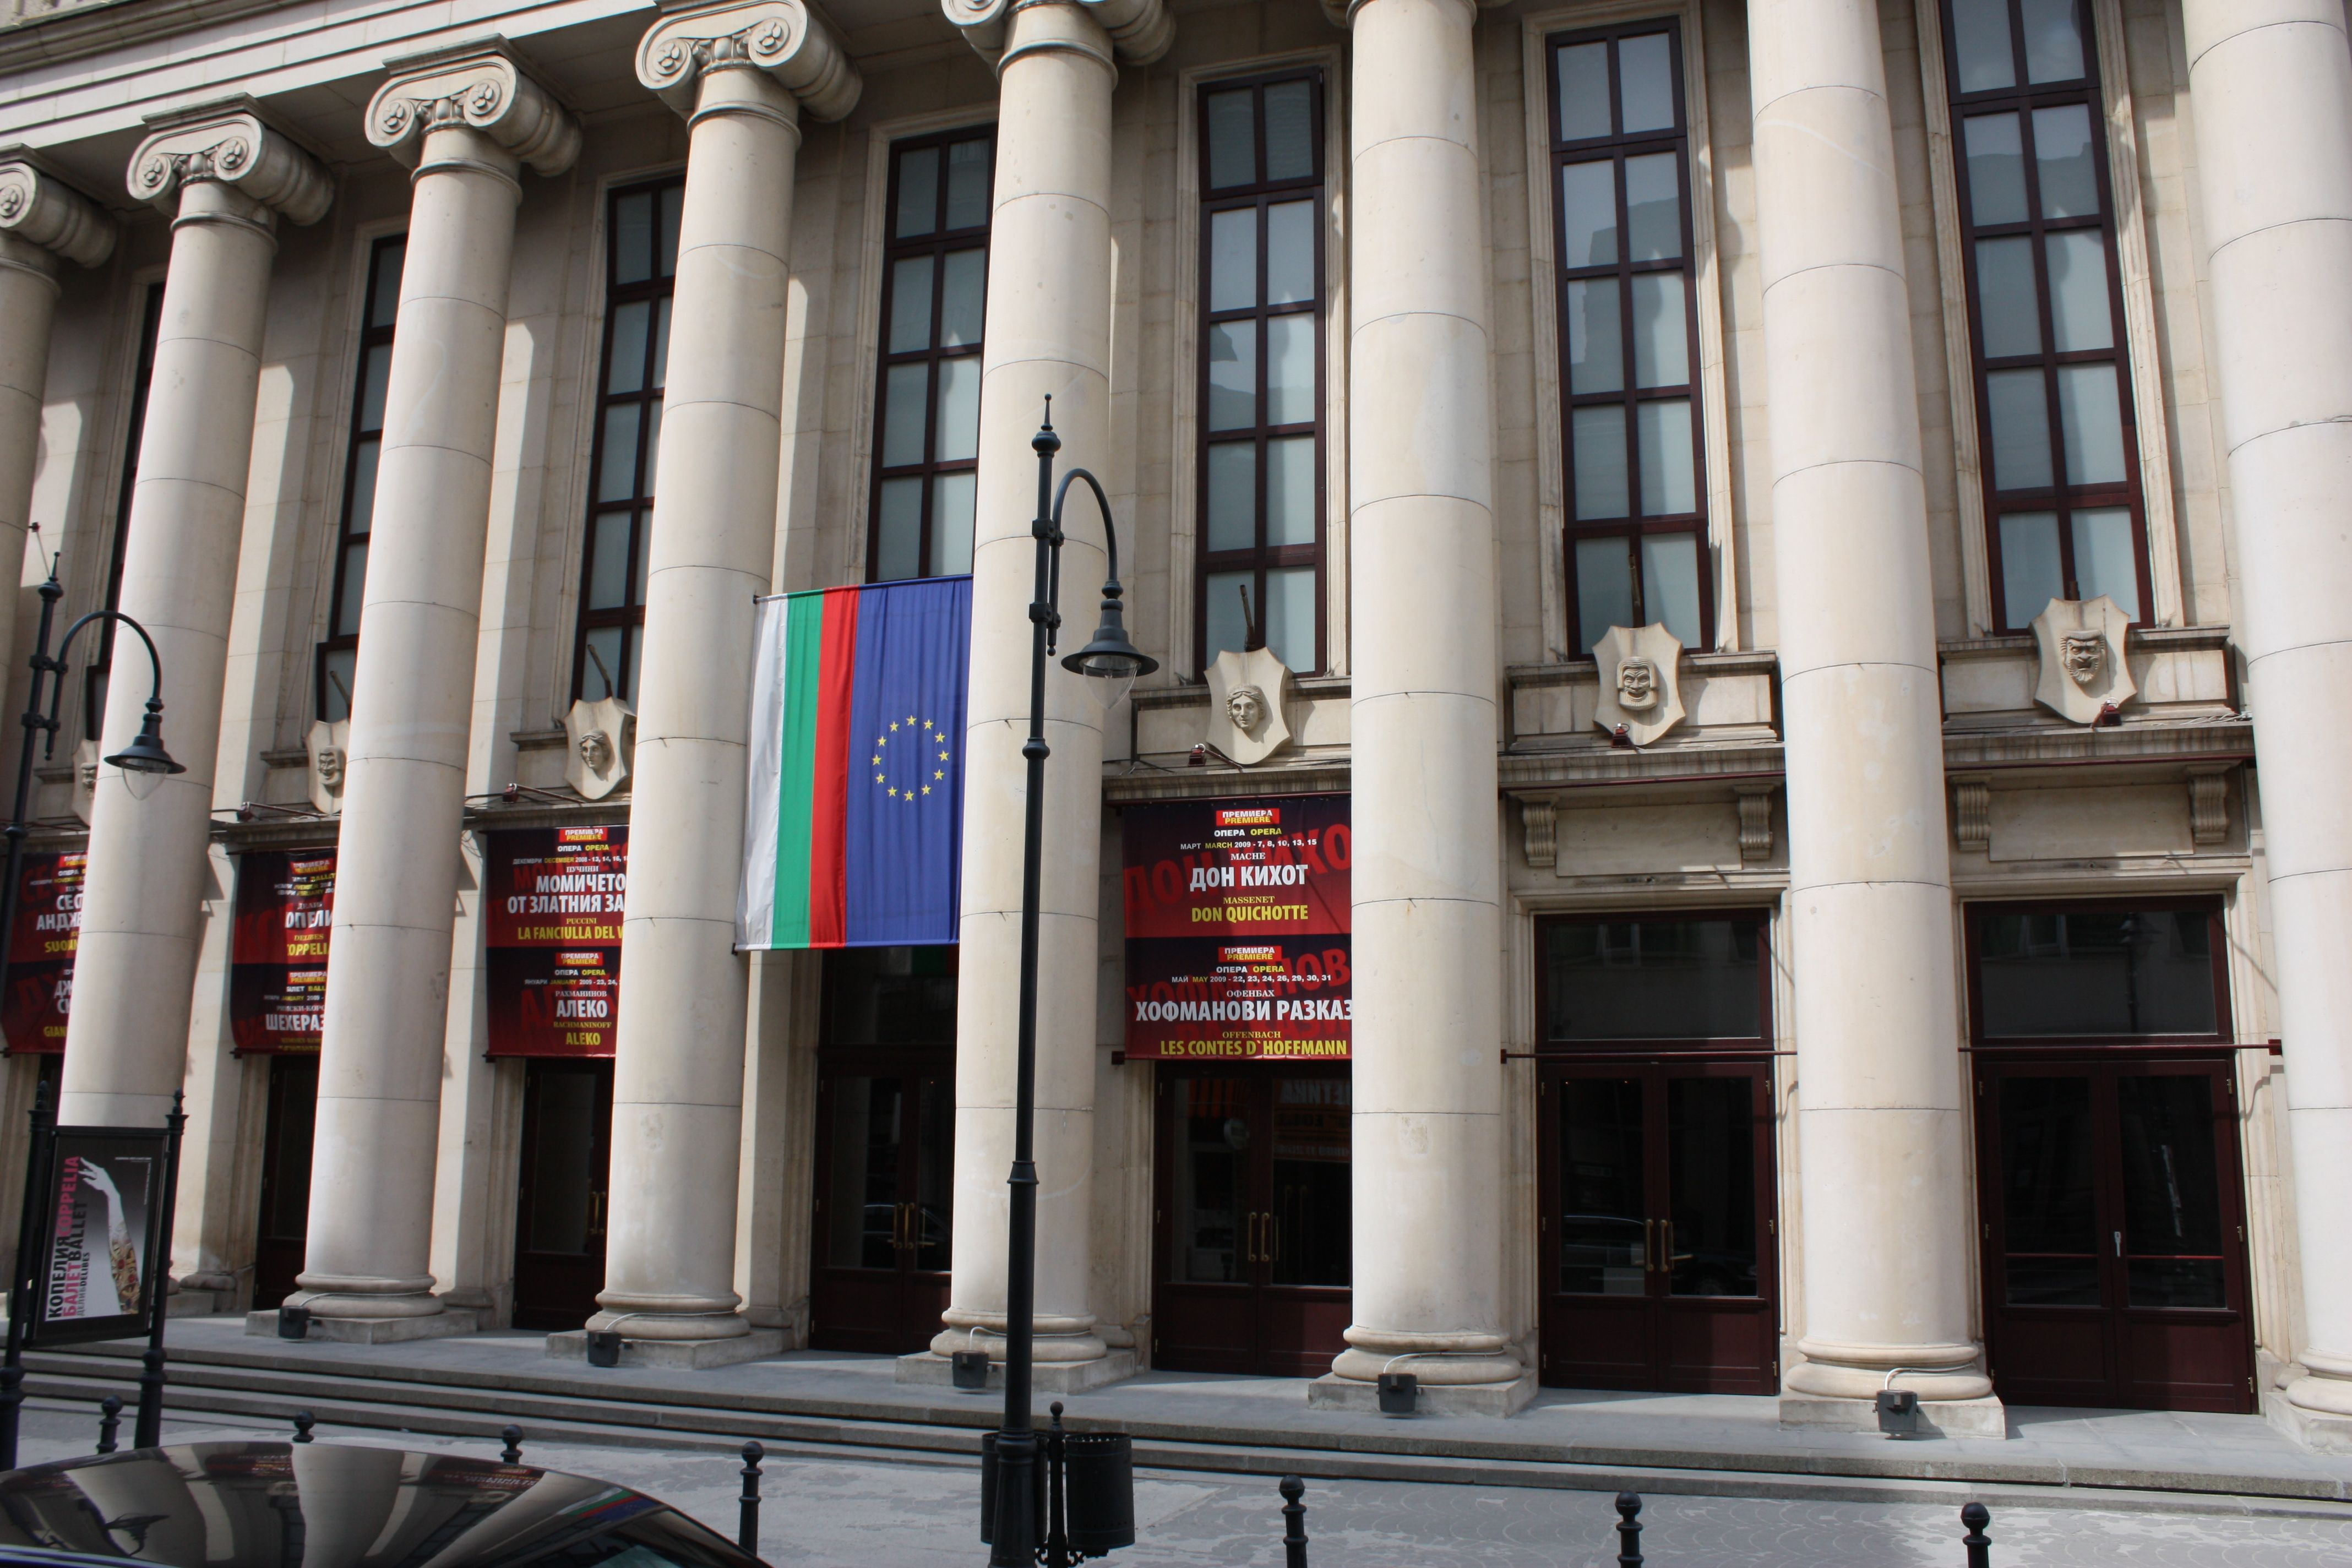 File:National Opera Sofia 2009 20090406 006.JPG - Wikimedia Commons